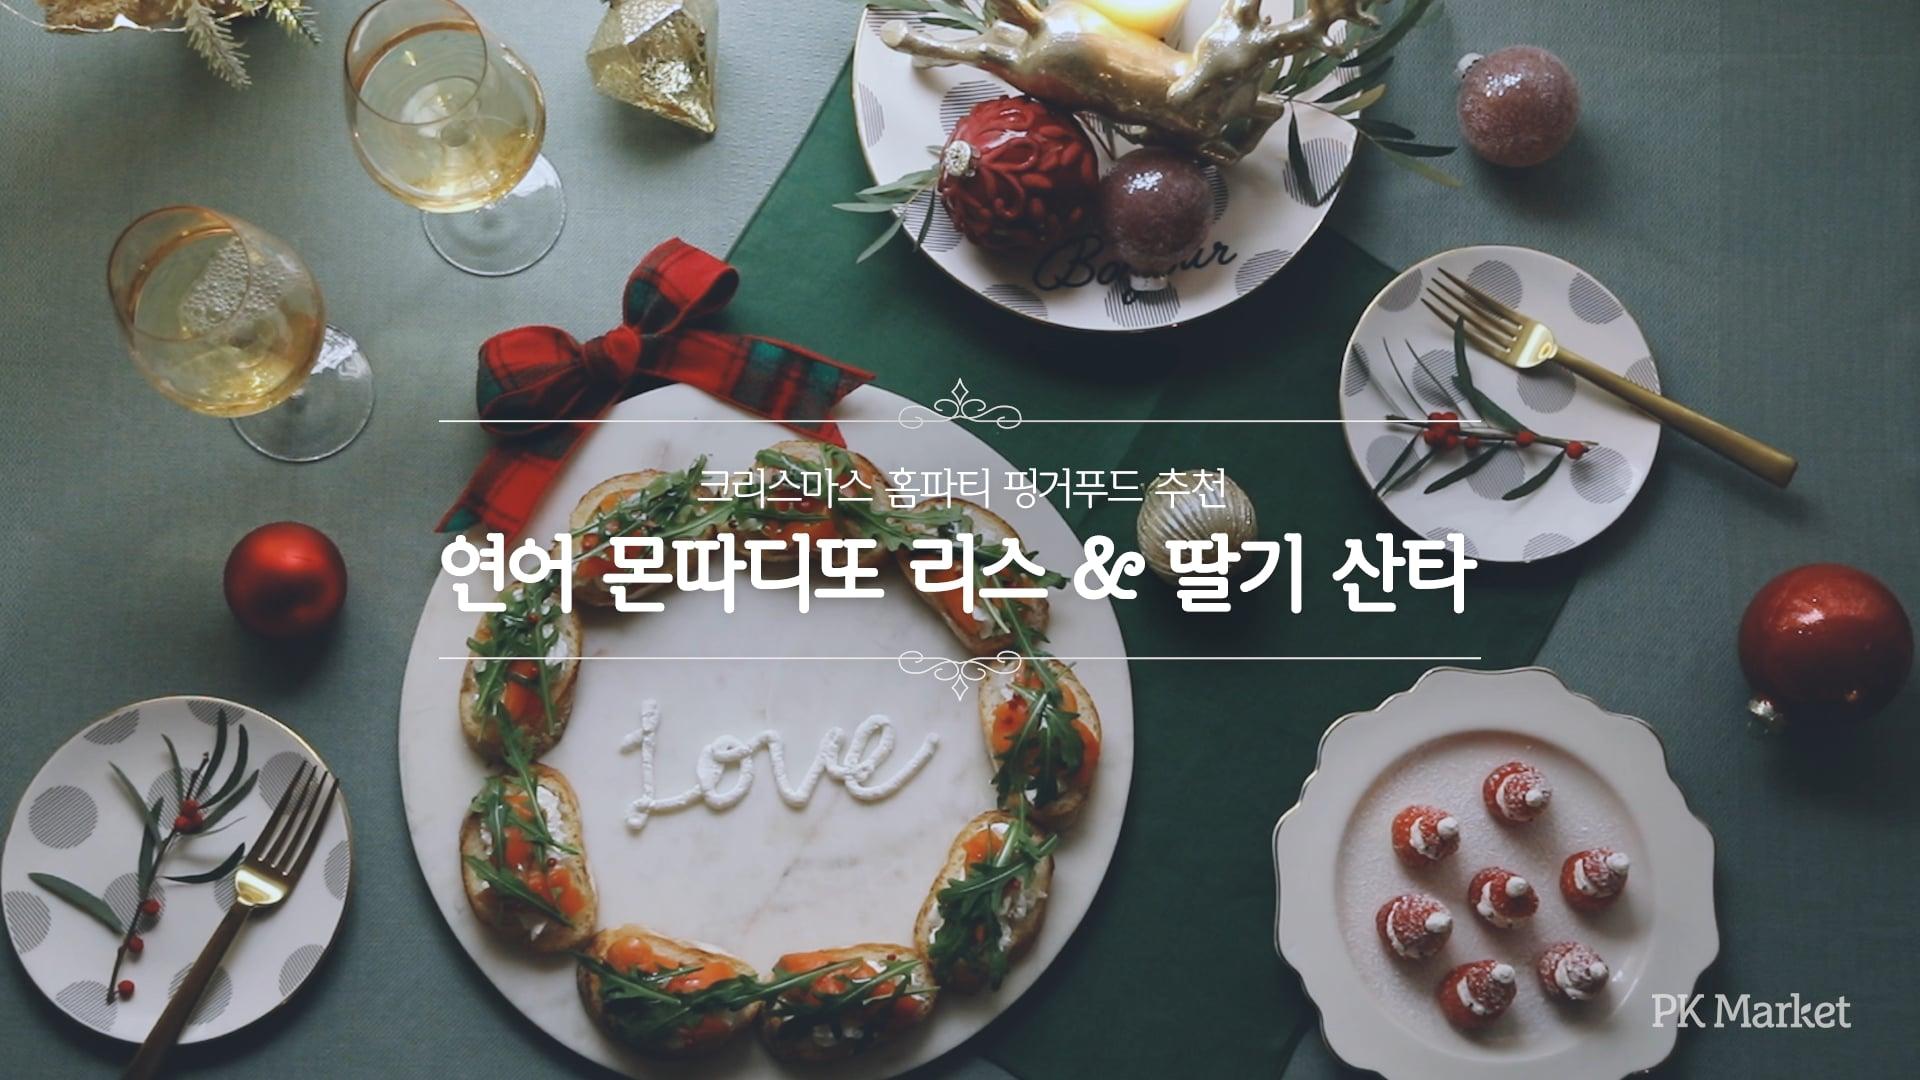 PK마켓_딸기산타